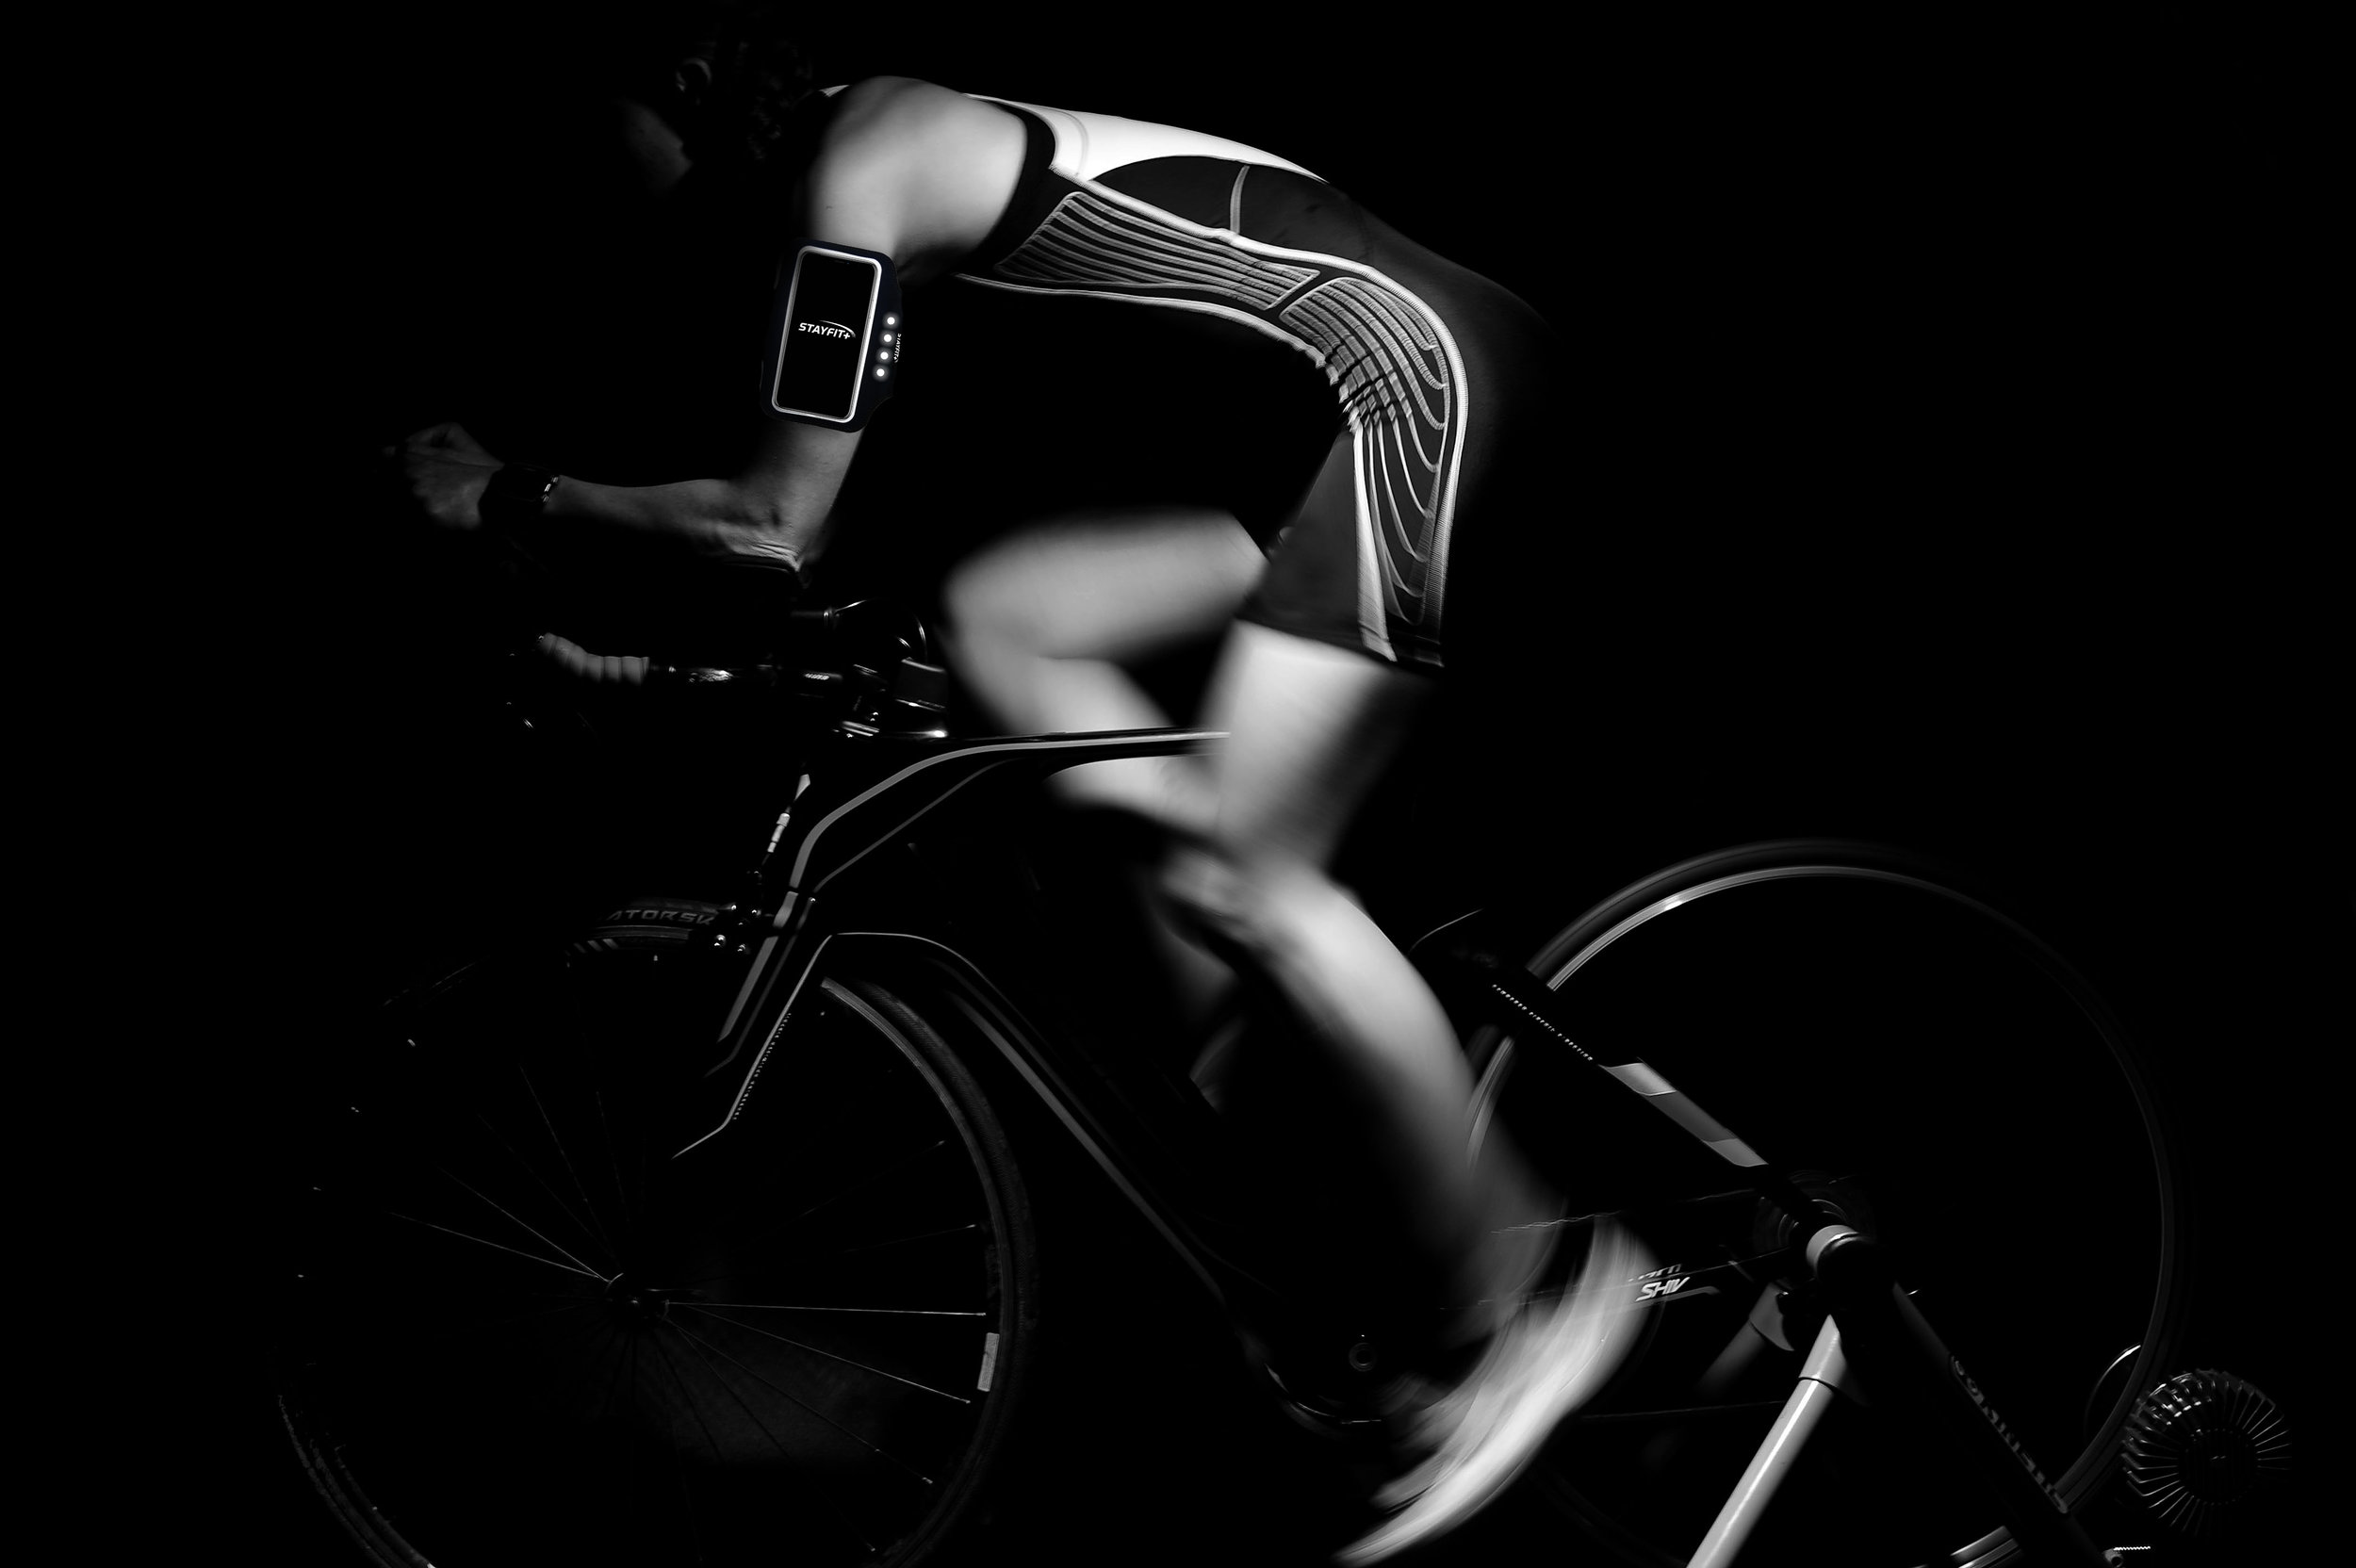 MotionCyclistBlack.jpg